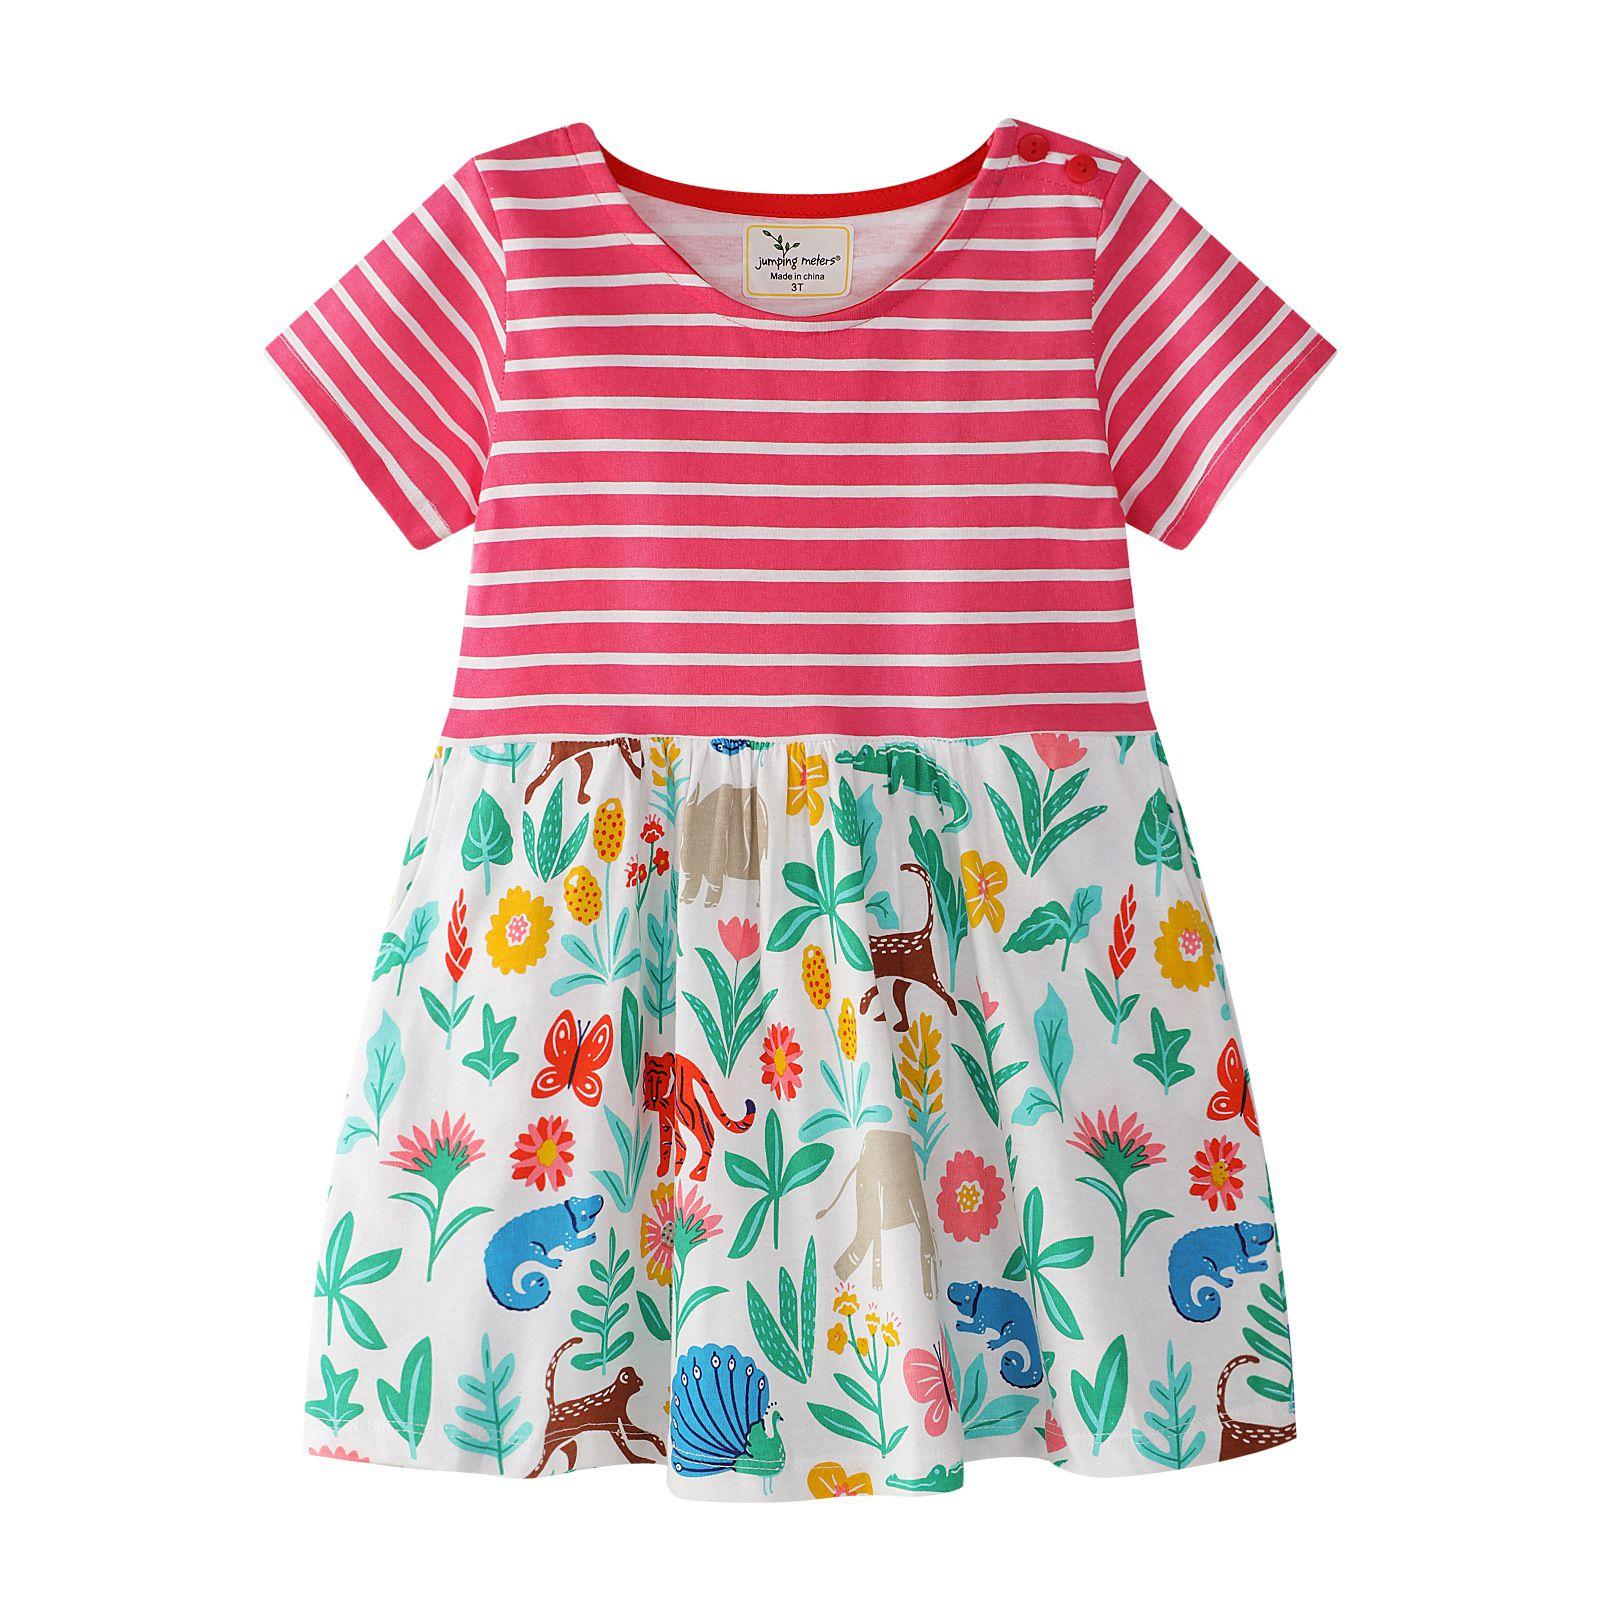 8d6404ebc03e Boutique Girl Dresses Uk